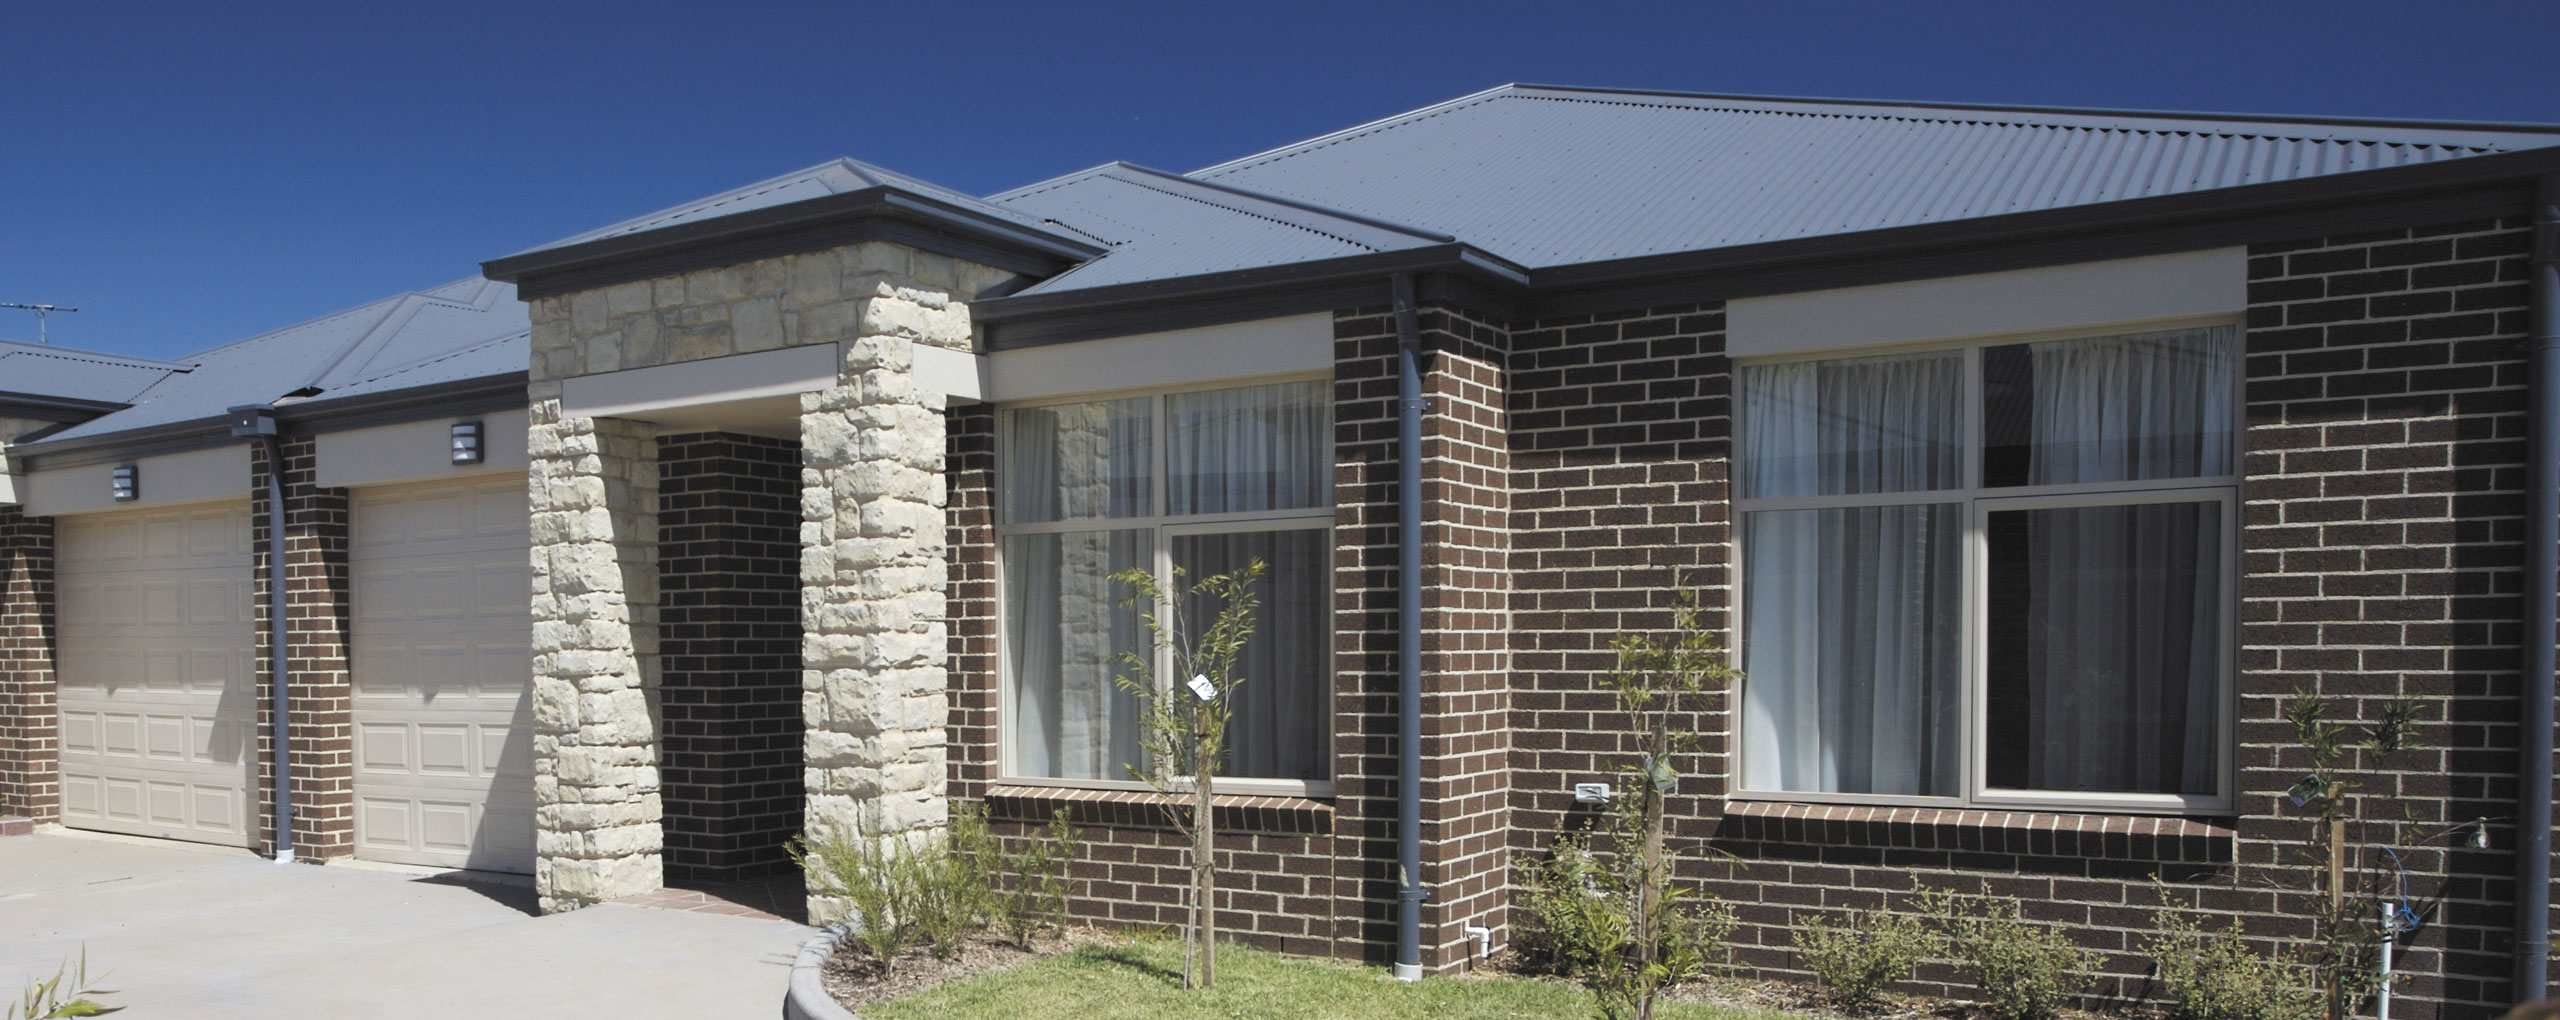 DeckingHomestead tan bricks   Our new house   Pinterest   Homesteads  . Most Popular Exterior Paint Colours Australia. Home Design Ideas